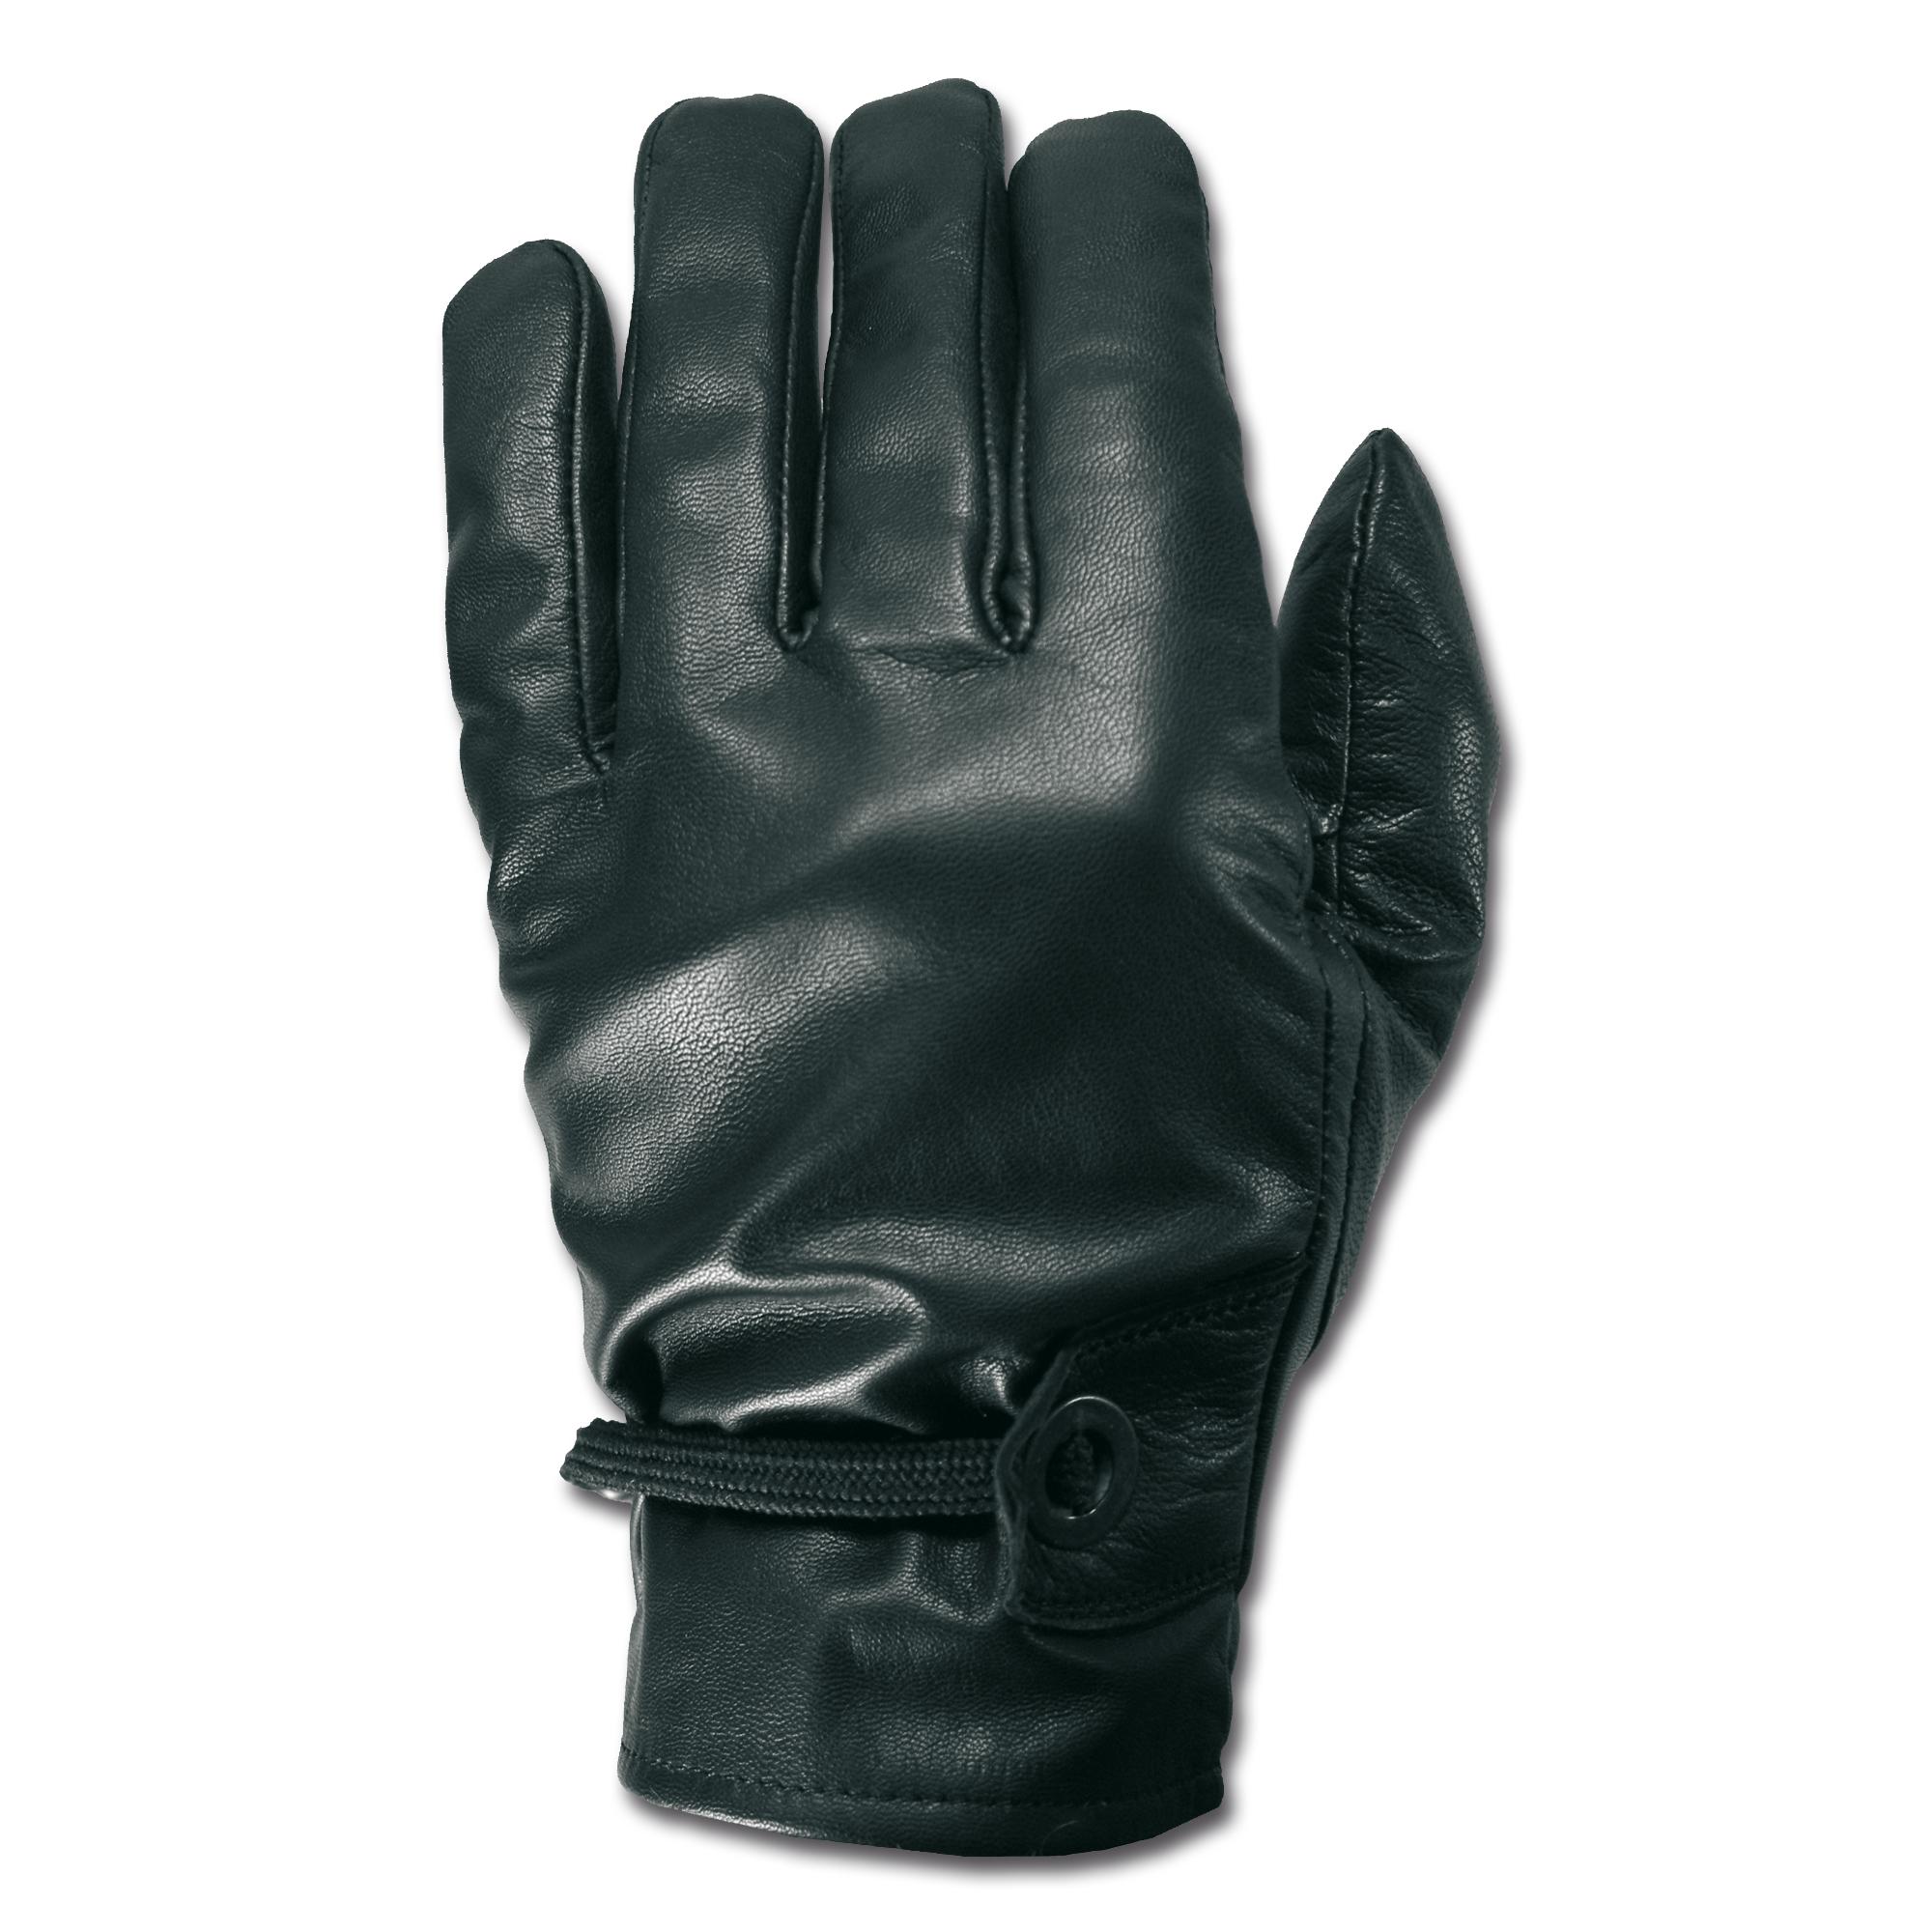 Western Gloves black